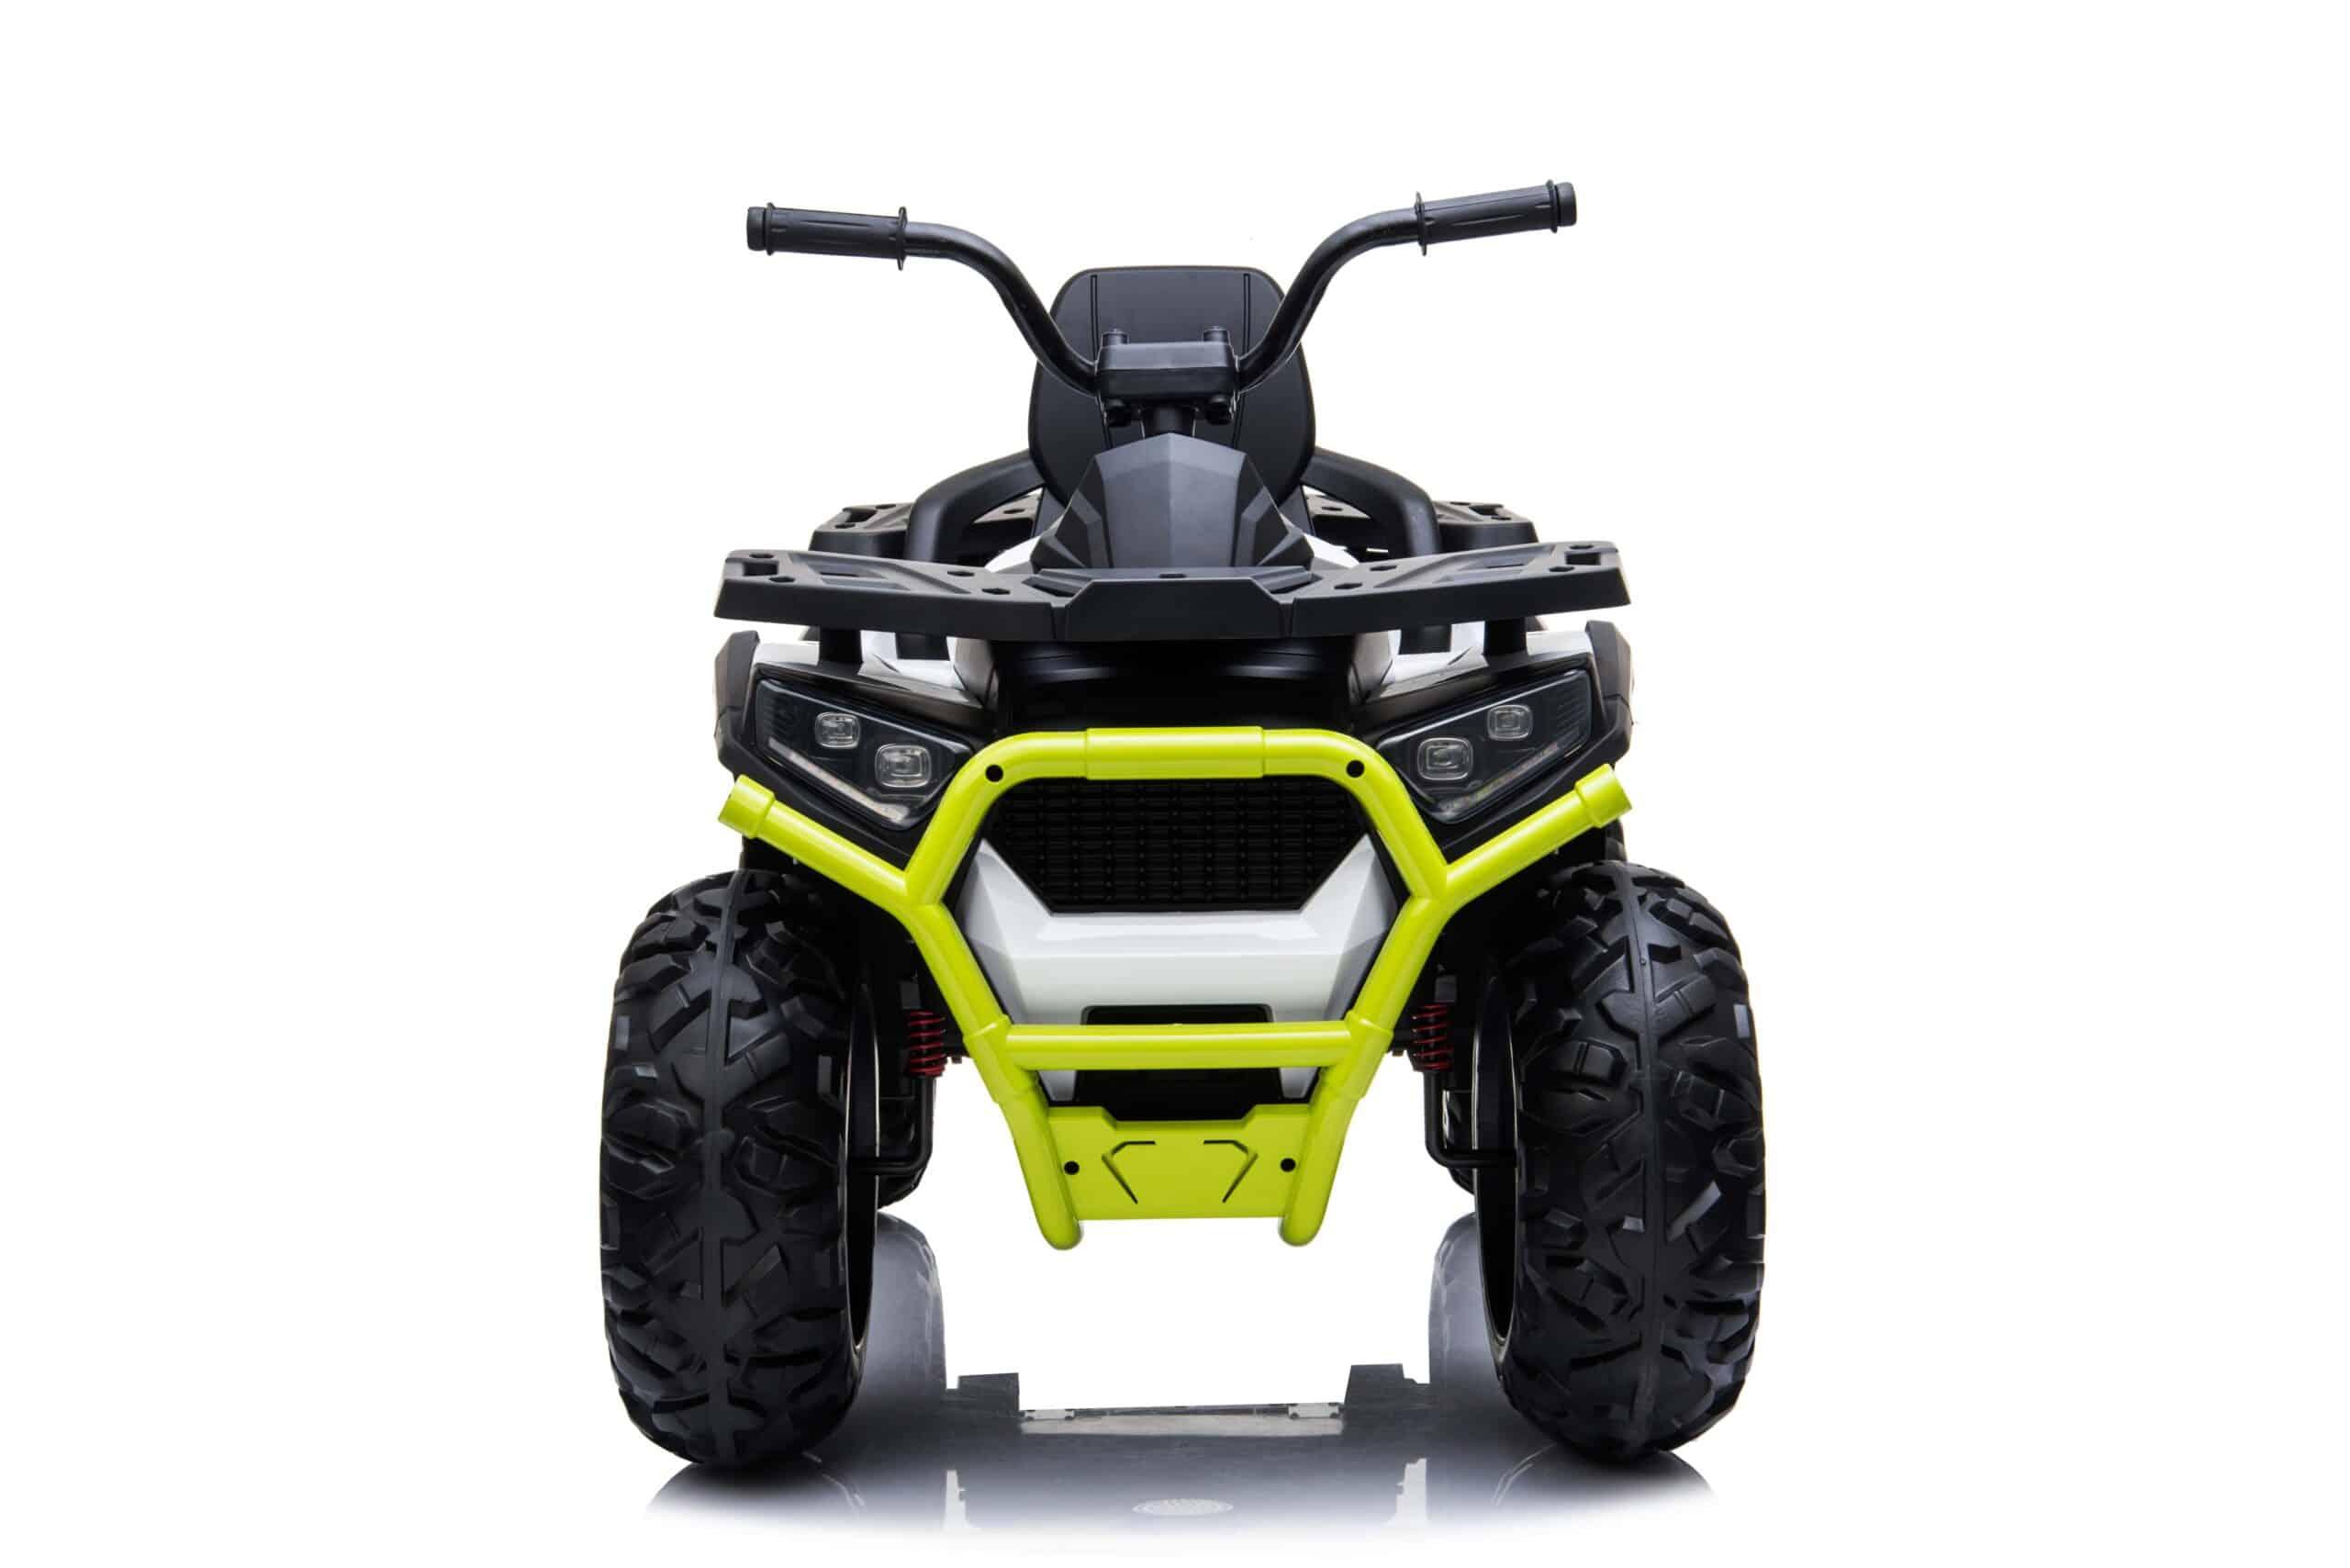 Kids Ride On Quad Bike 24v 4wd Bluetooth And Radio – White